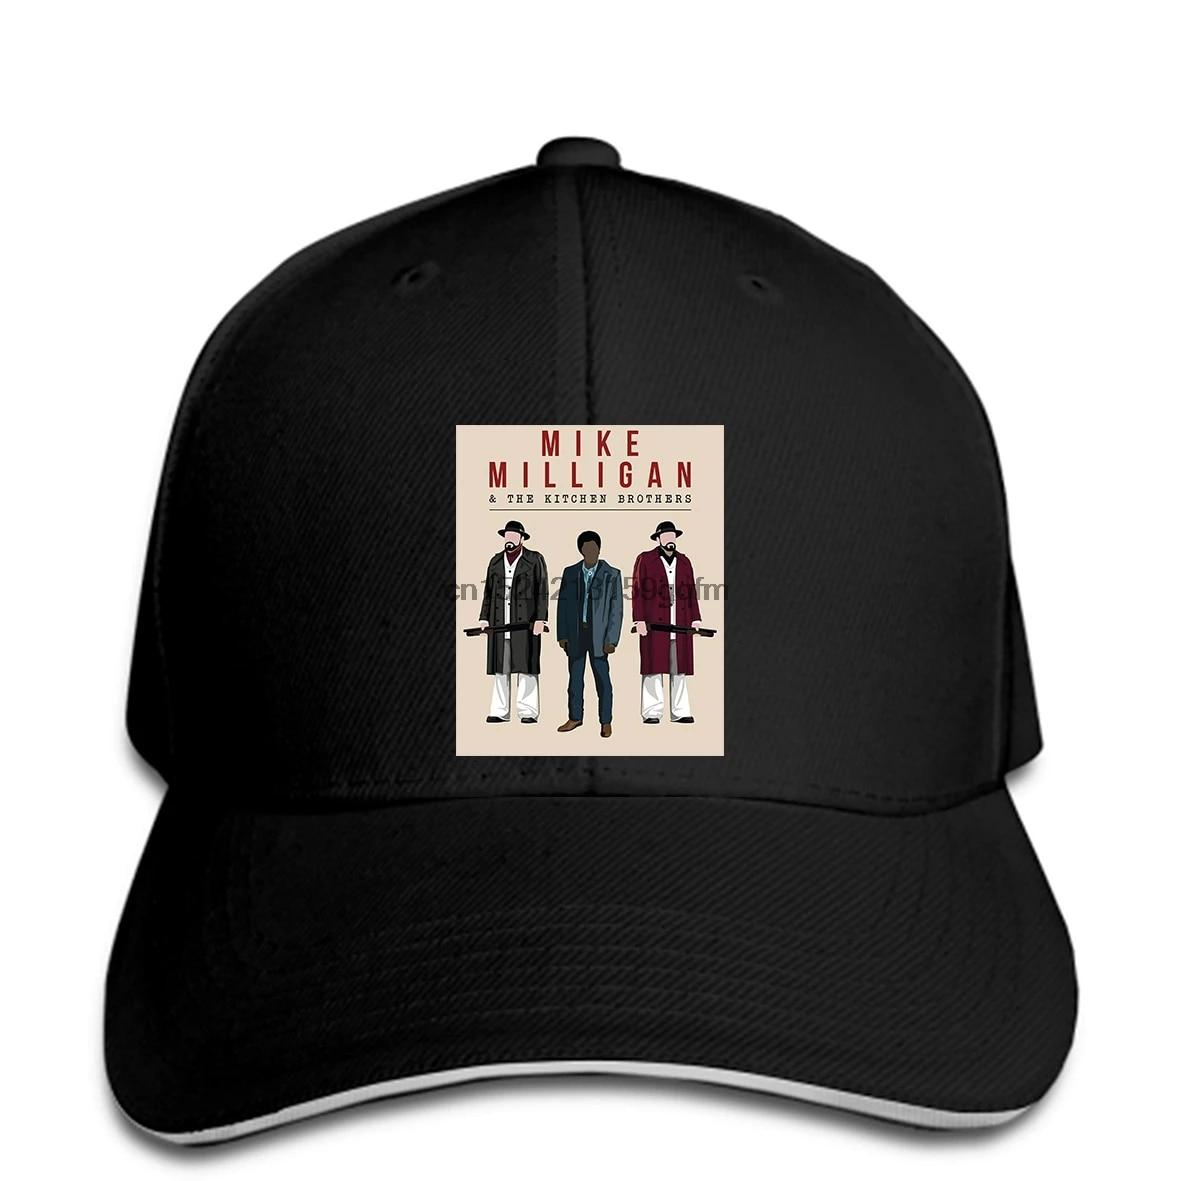 Baseball Cap Fargo Mike Milliganthe Kitchen Brothers Snapback Hat Peaked Men S Baseball Caps Aliexpress